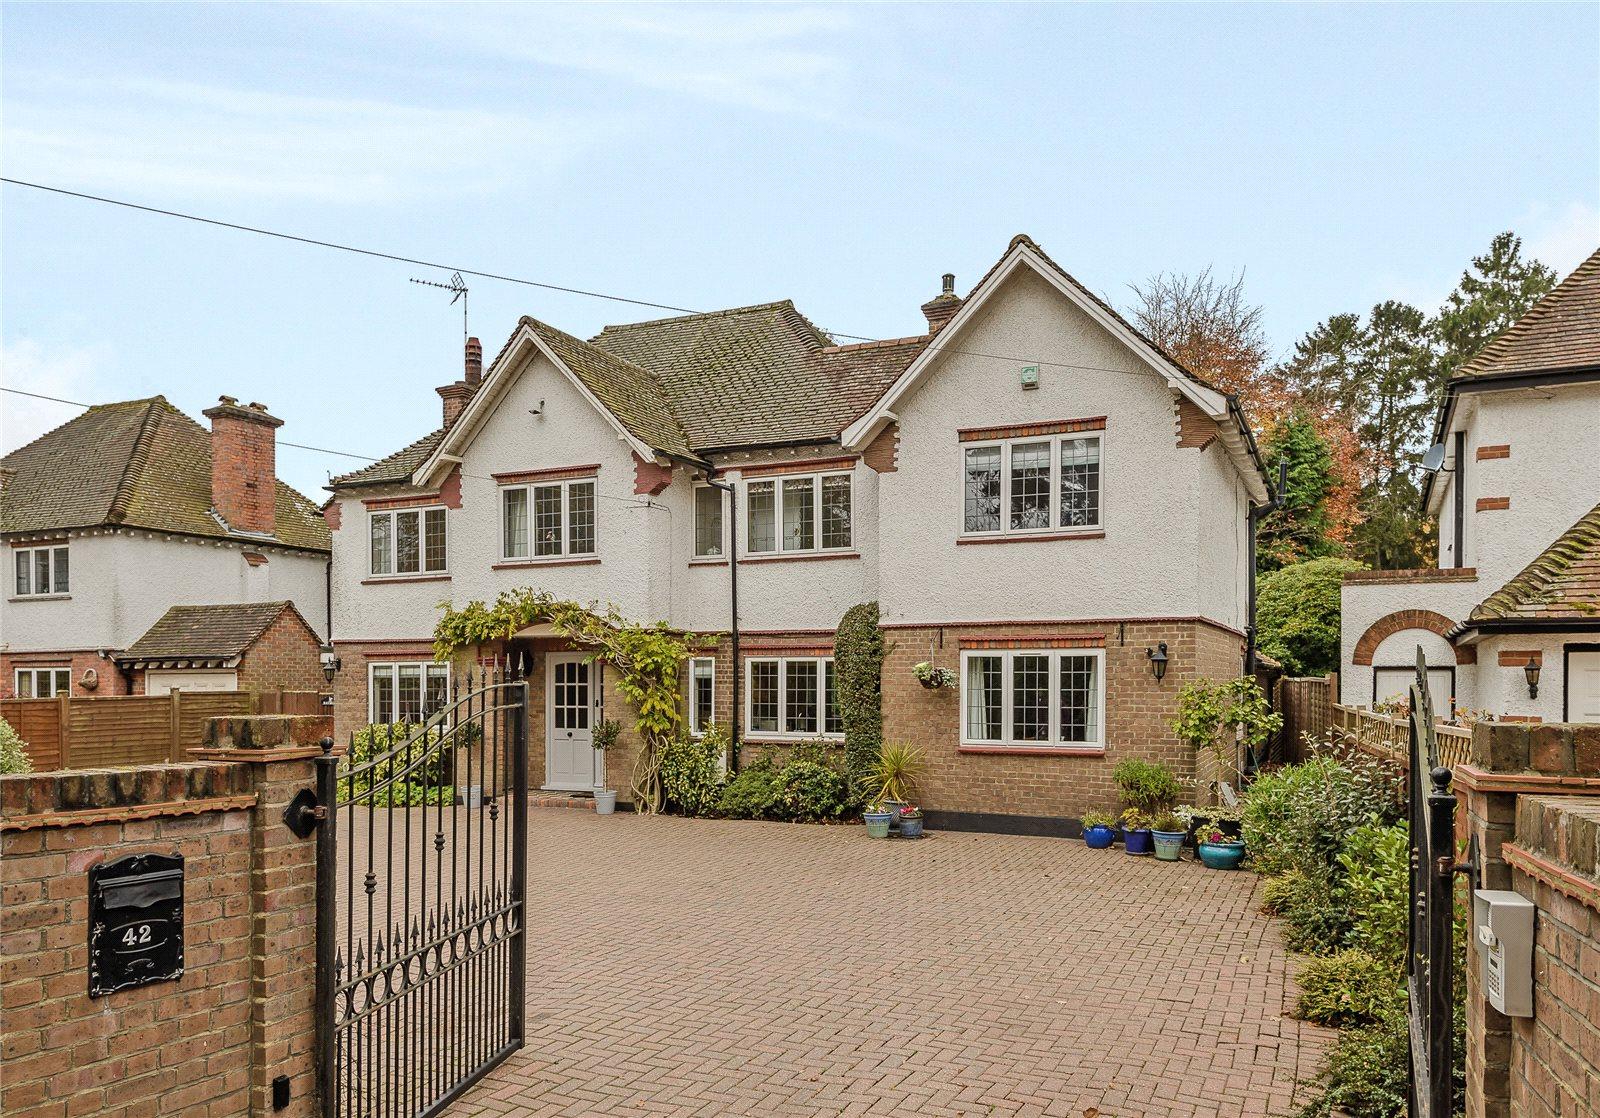 独户住宅 为 销售 在 Fulmer Road, Gerrards Cross, Buckinghamshire, SL9 Gerrards Cross, 英格兰